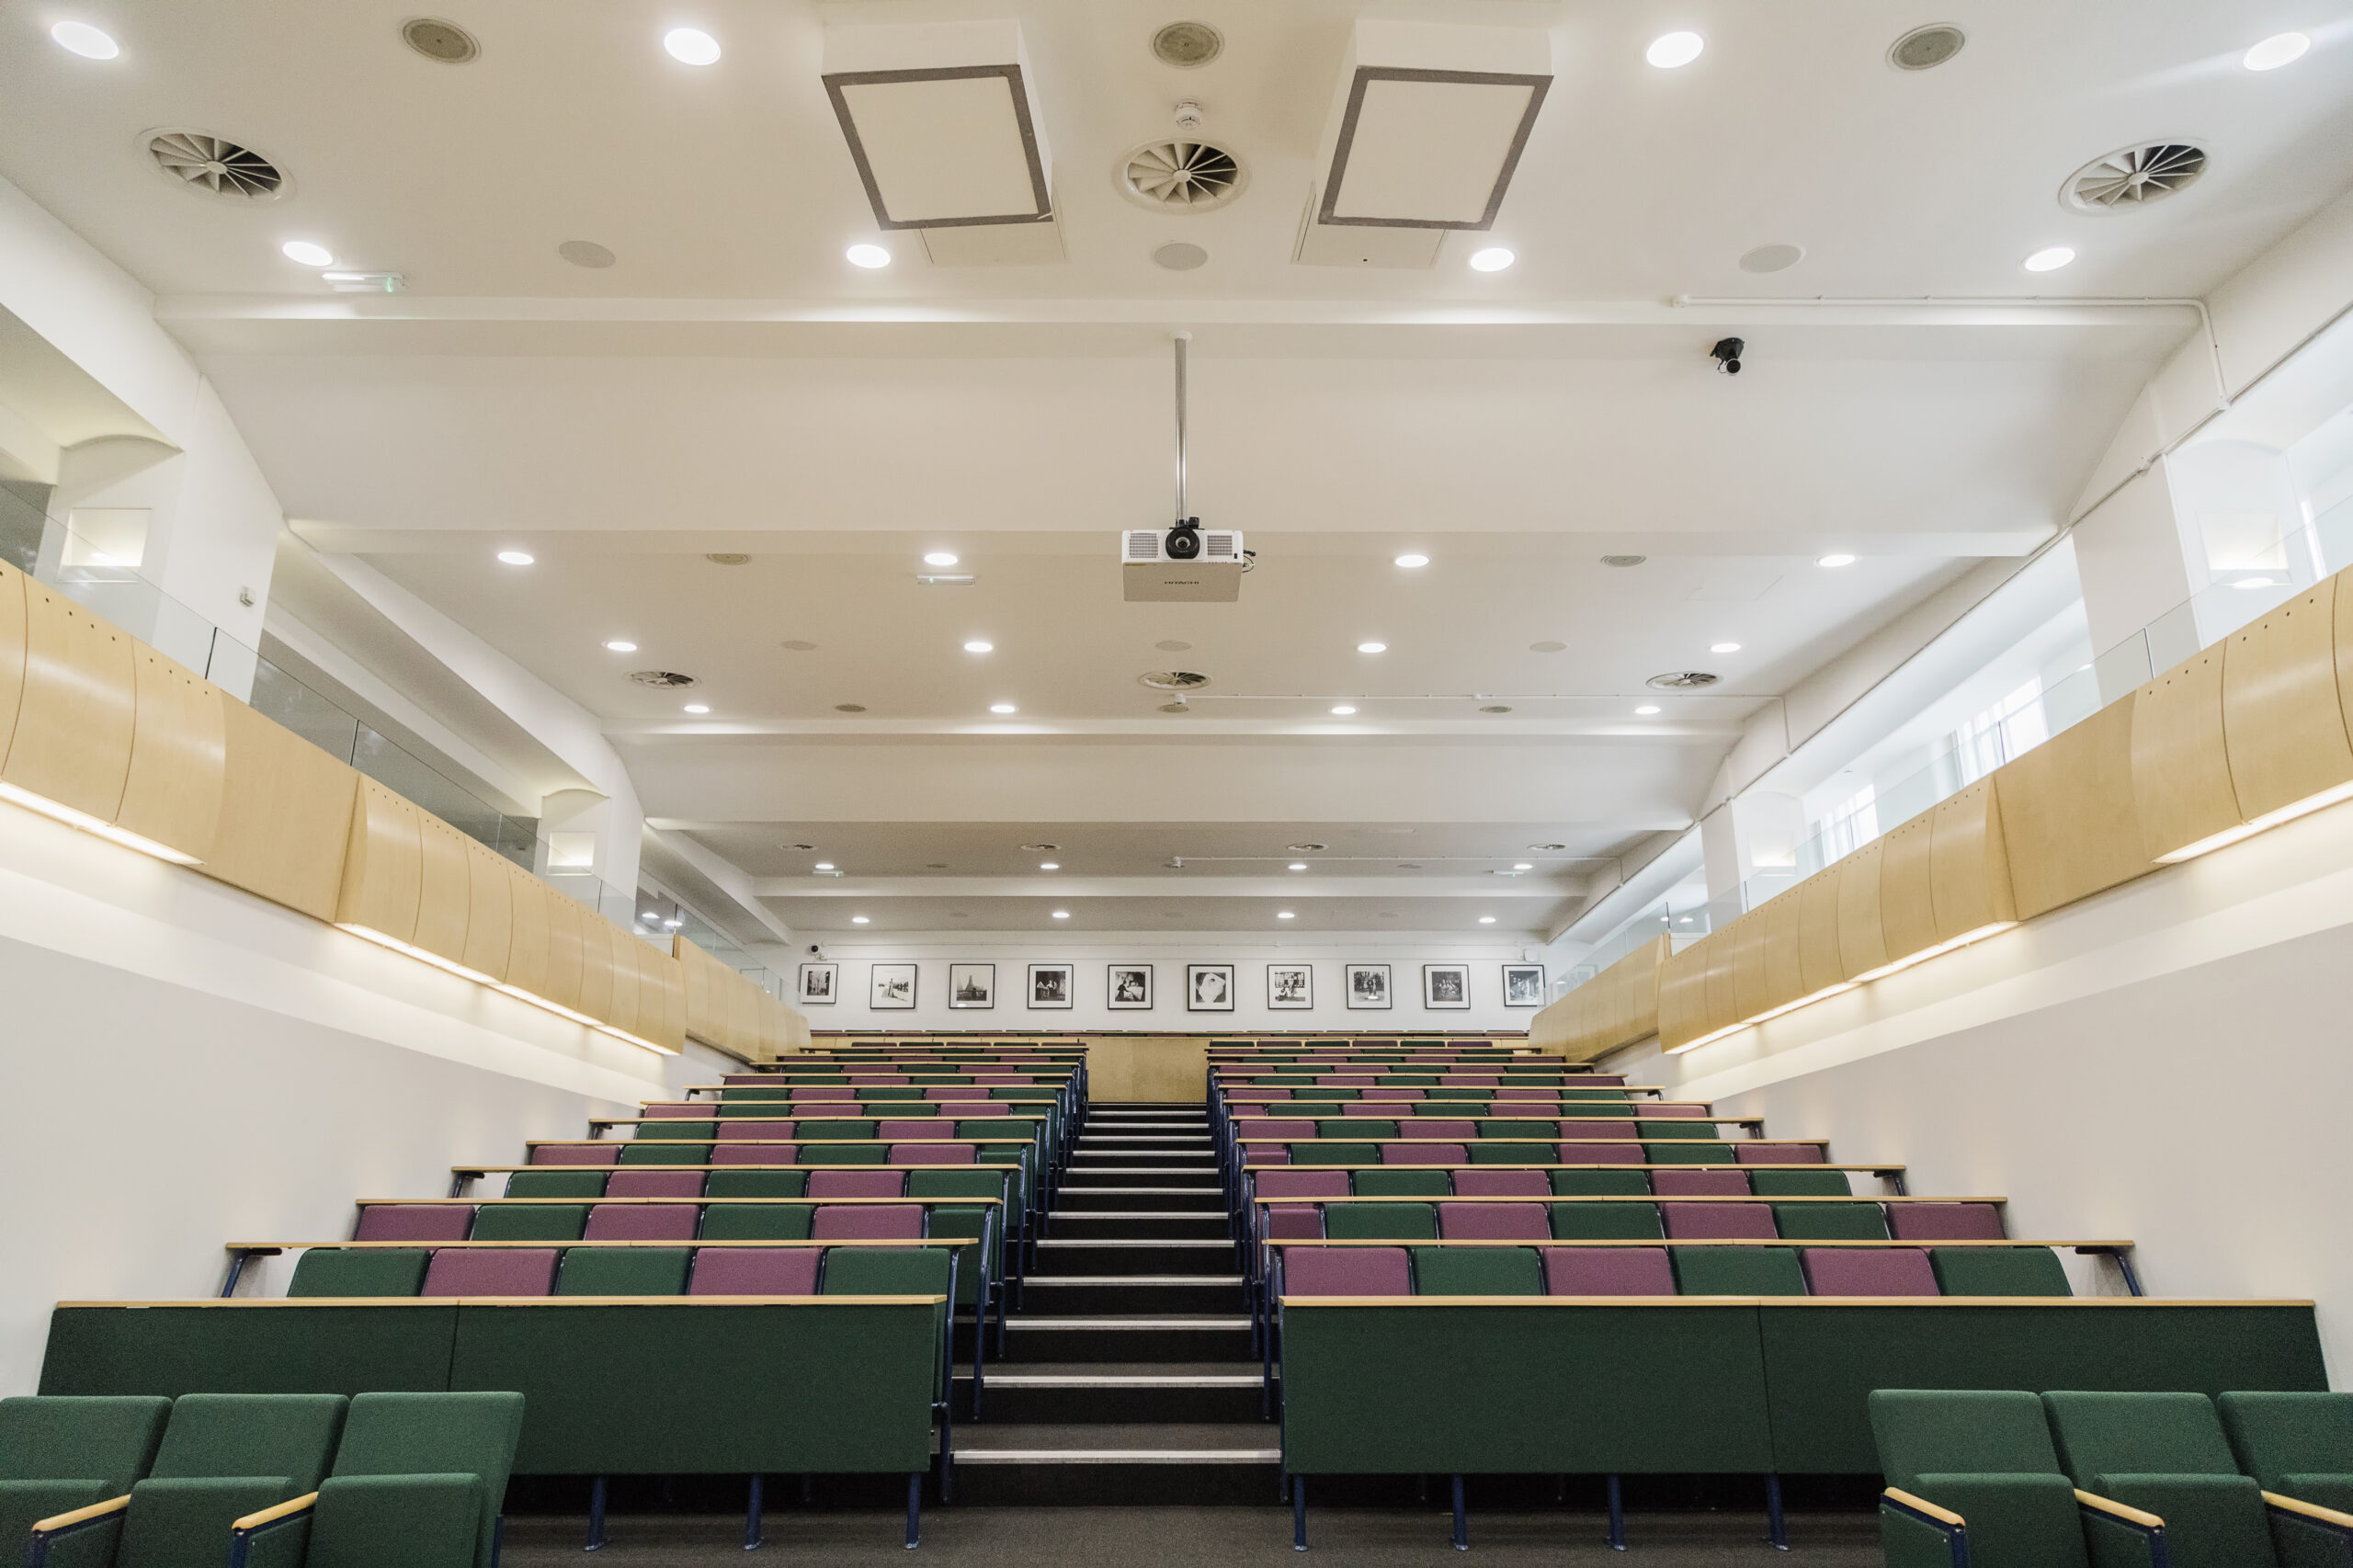 David Game College as your examination centre